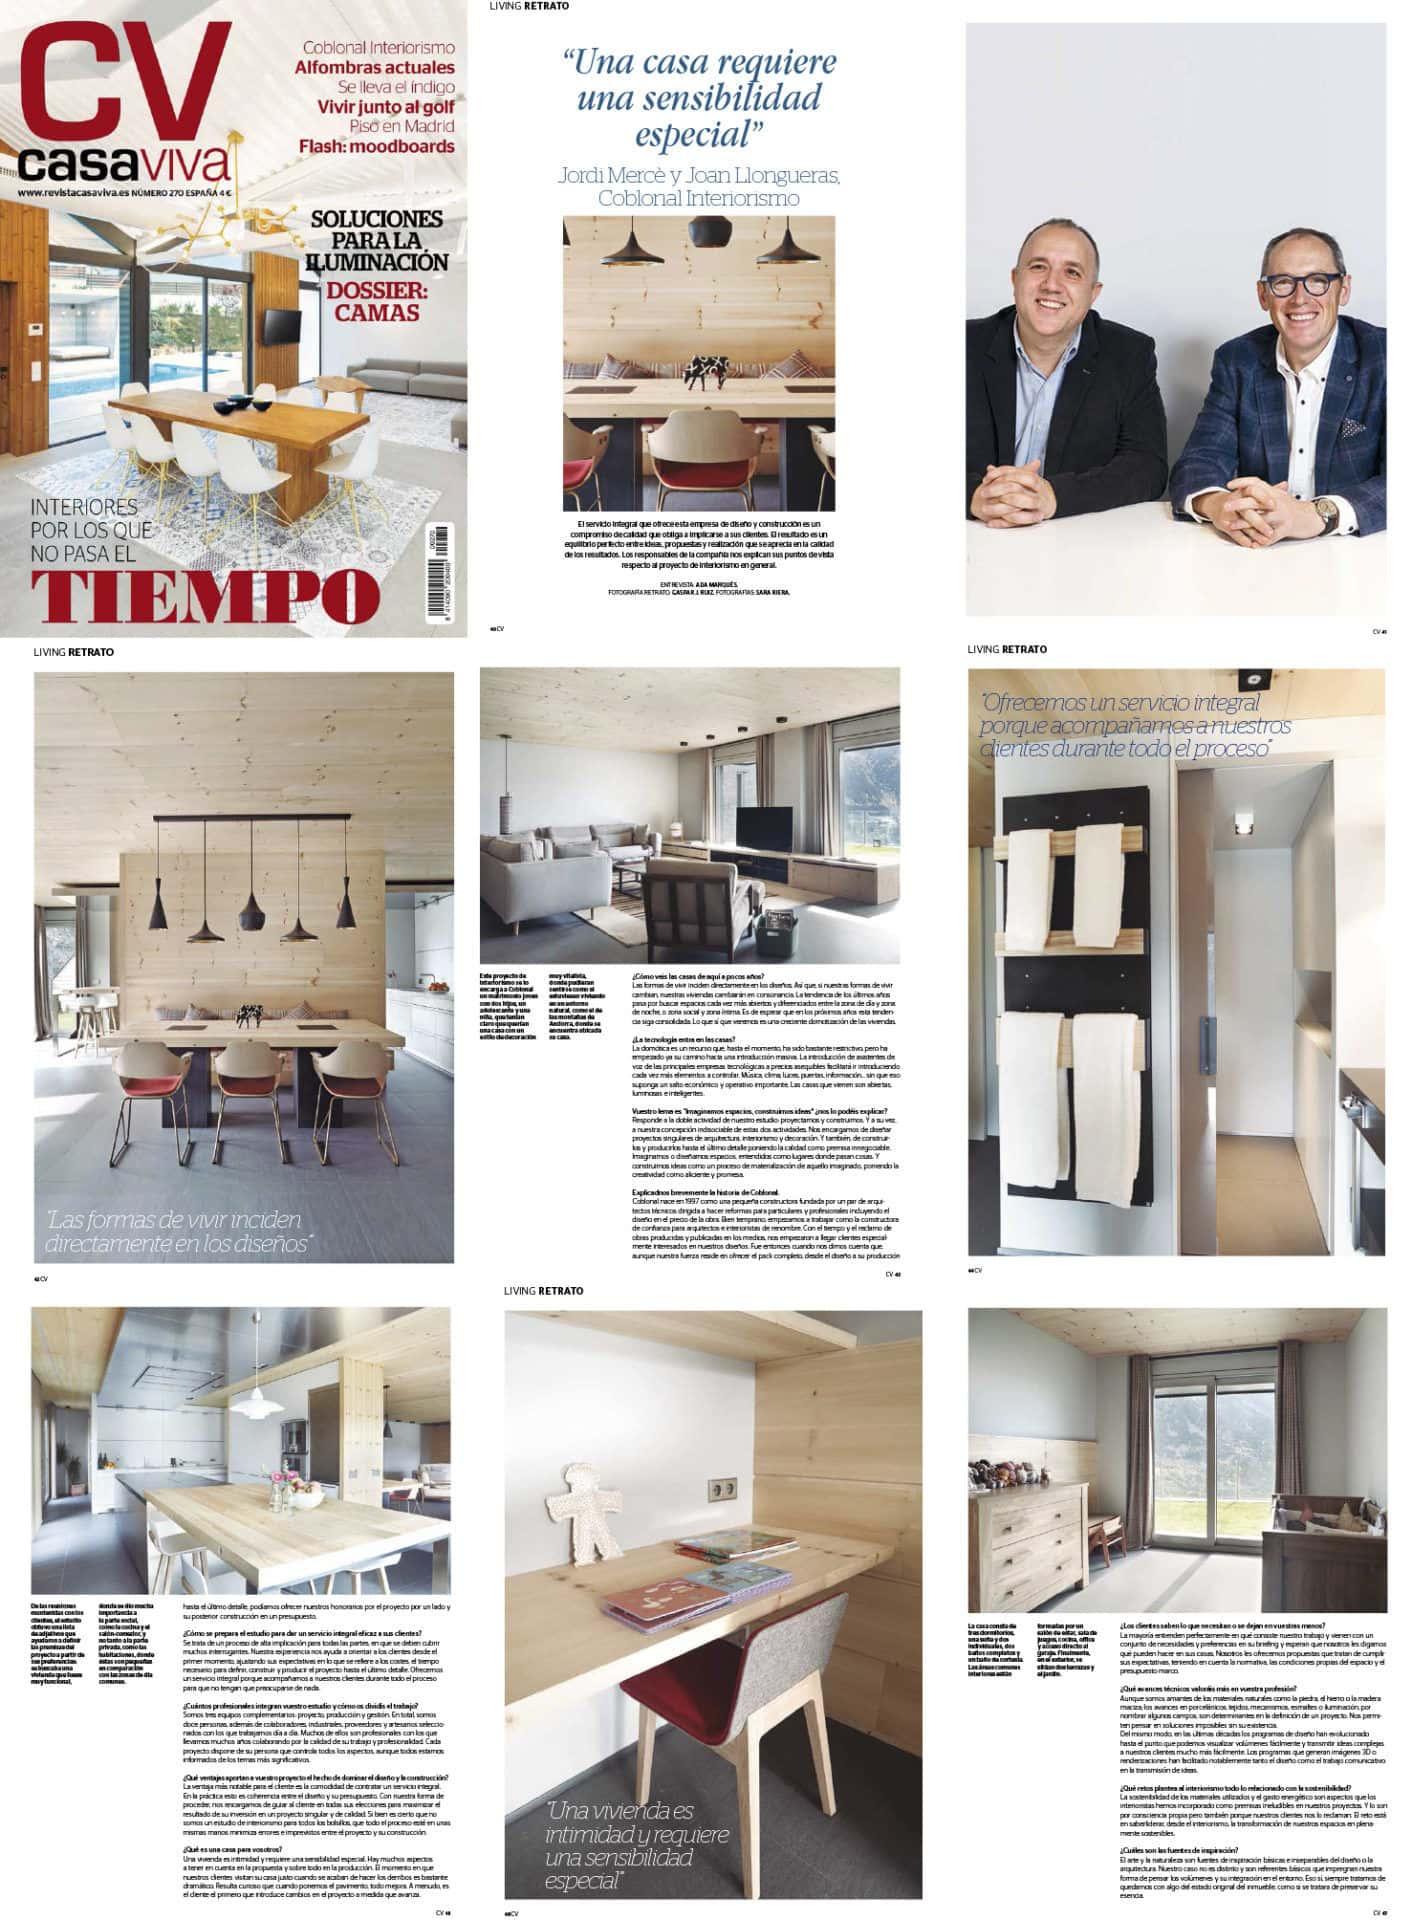 Entrevista a la revista Casa Viva